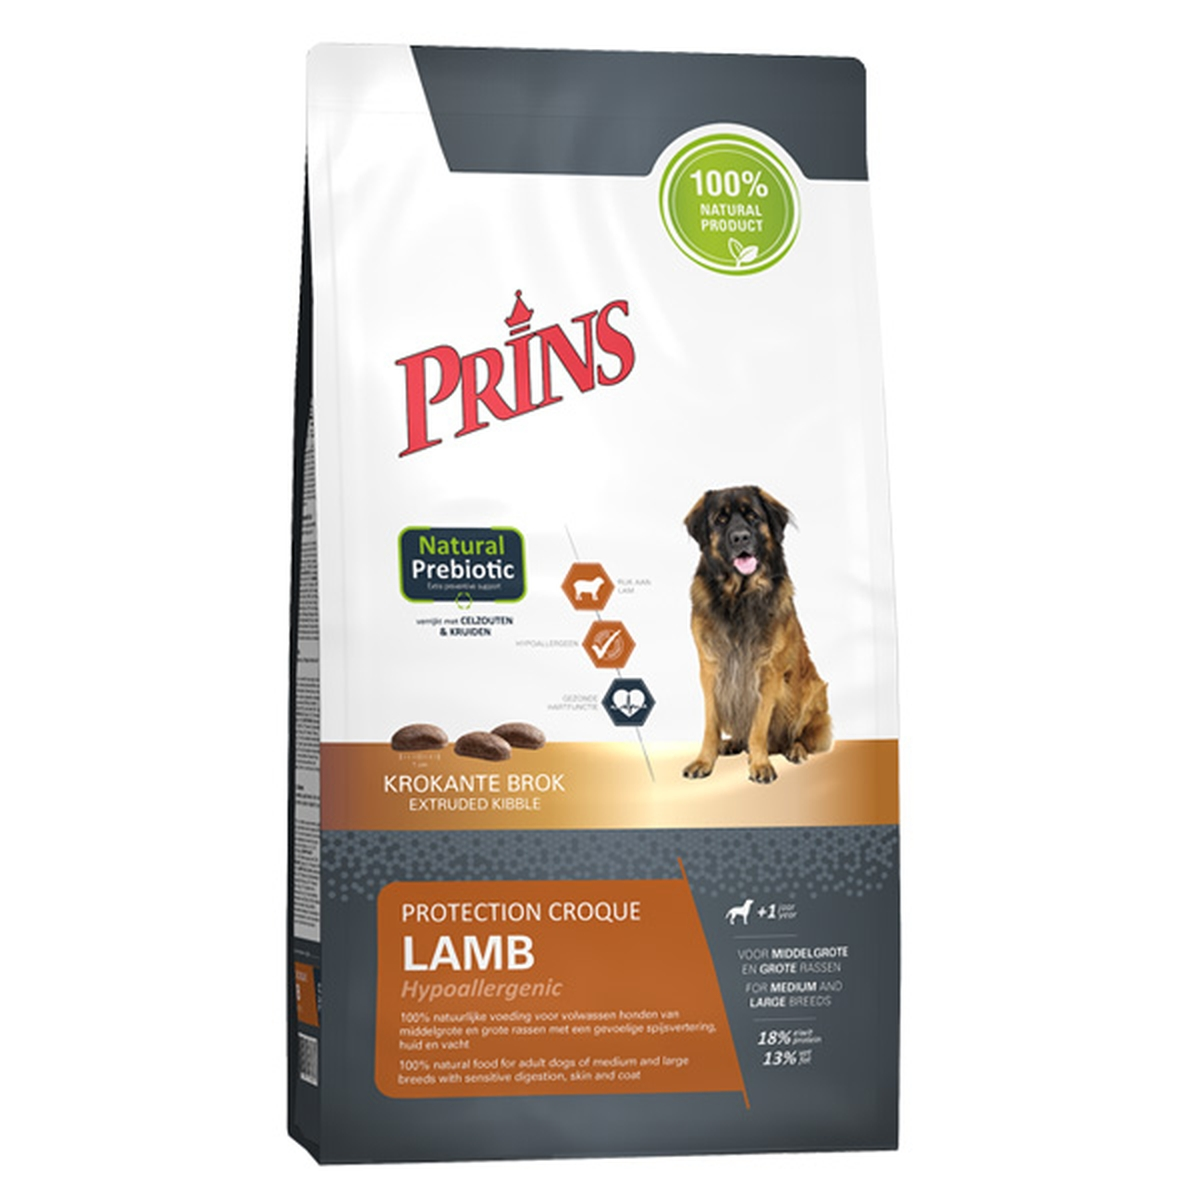 Prins Procare Protection Croque Lamb